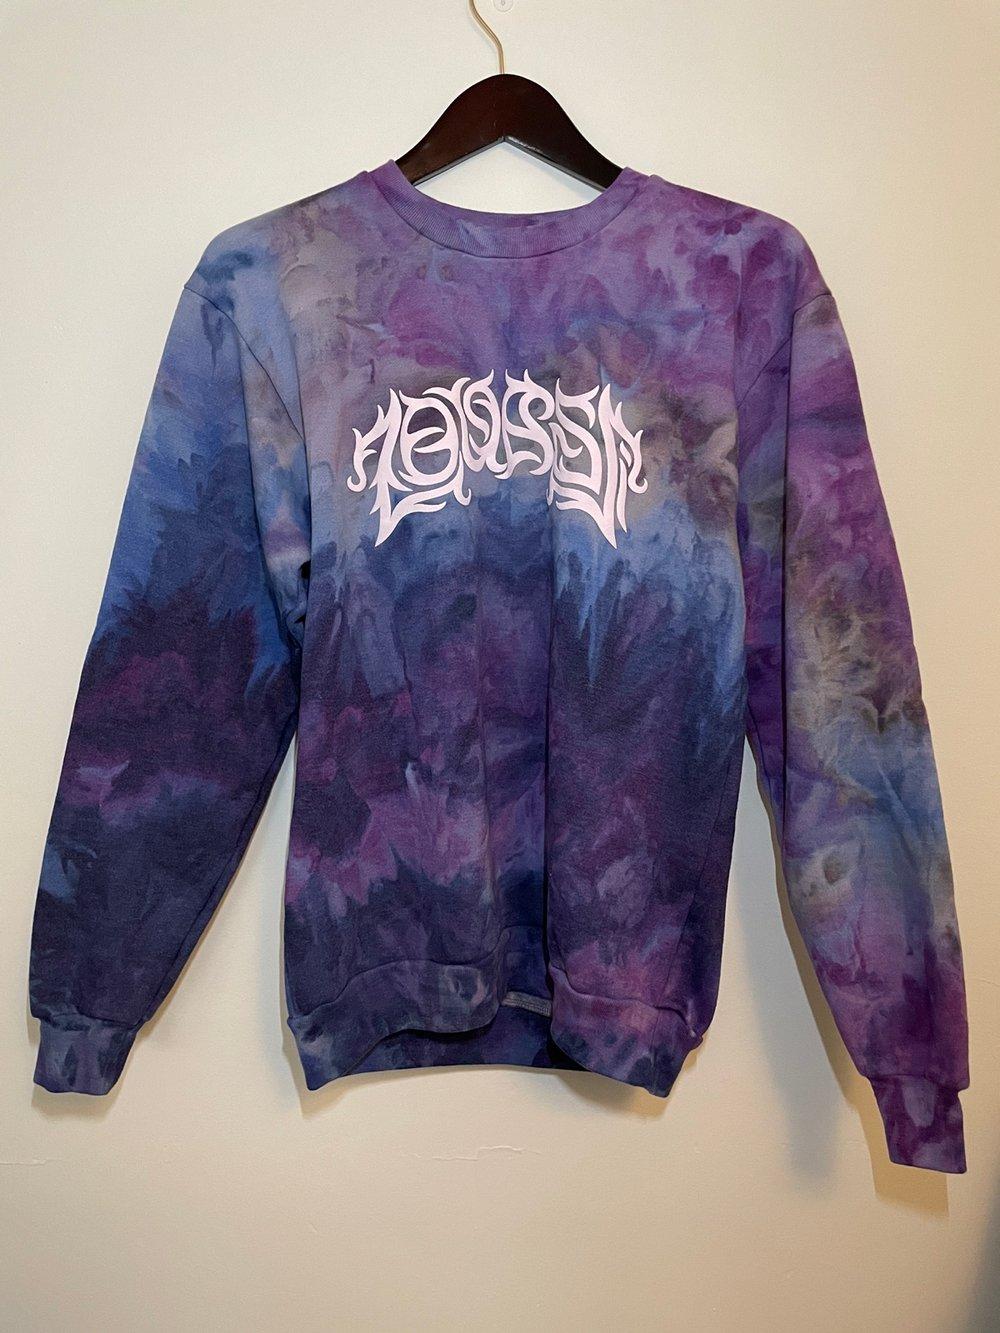 Tie-Dye Sweatshirt #6 - Medium